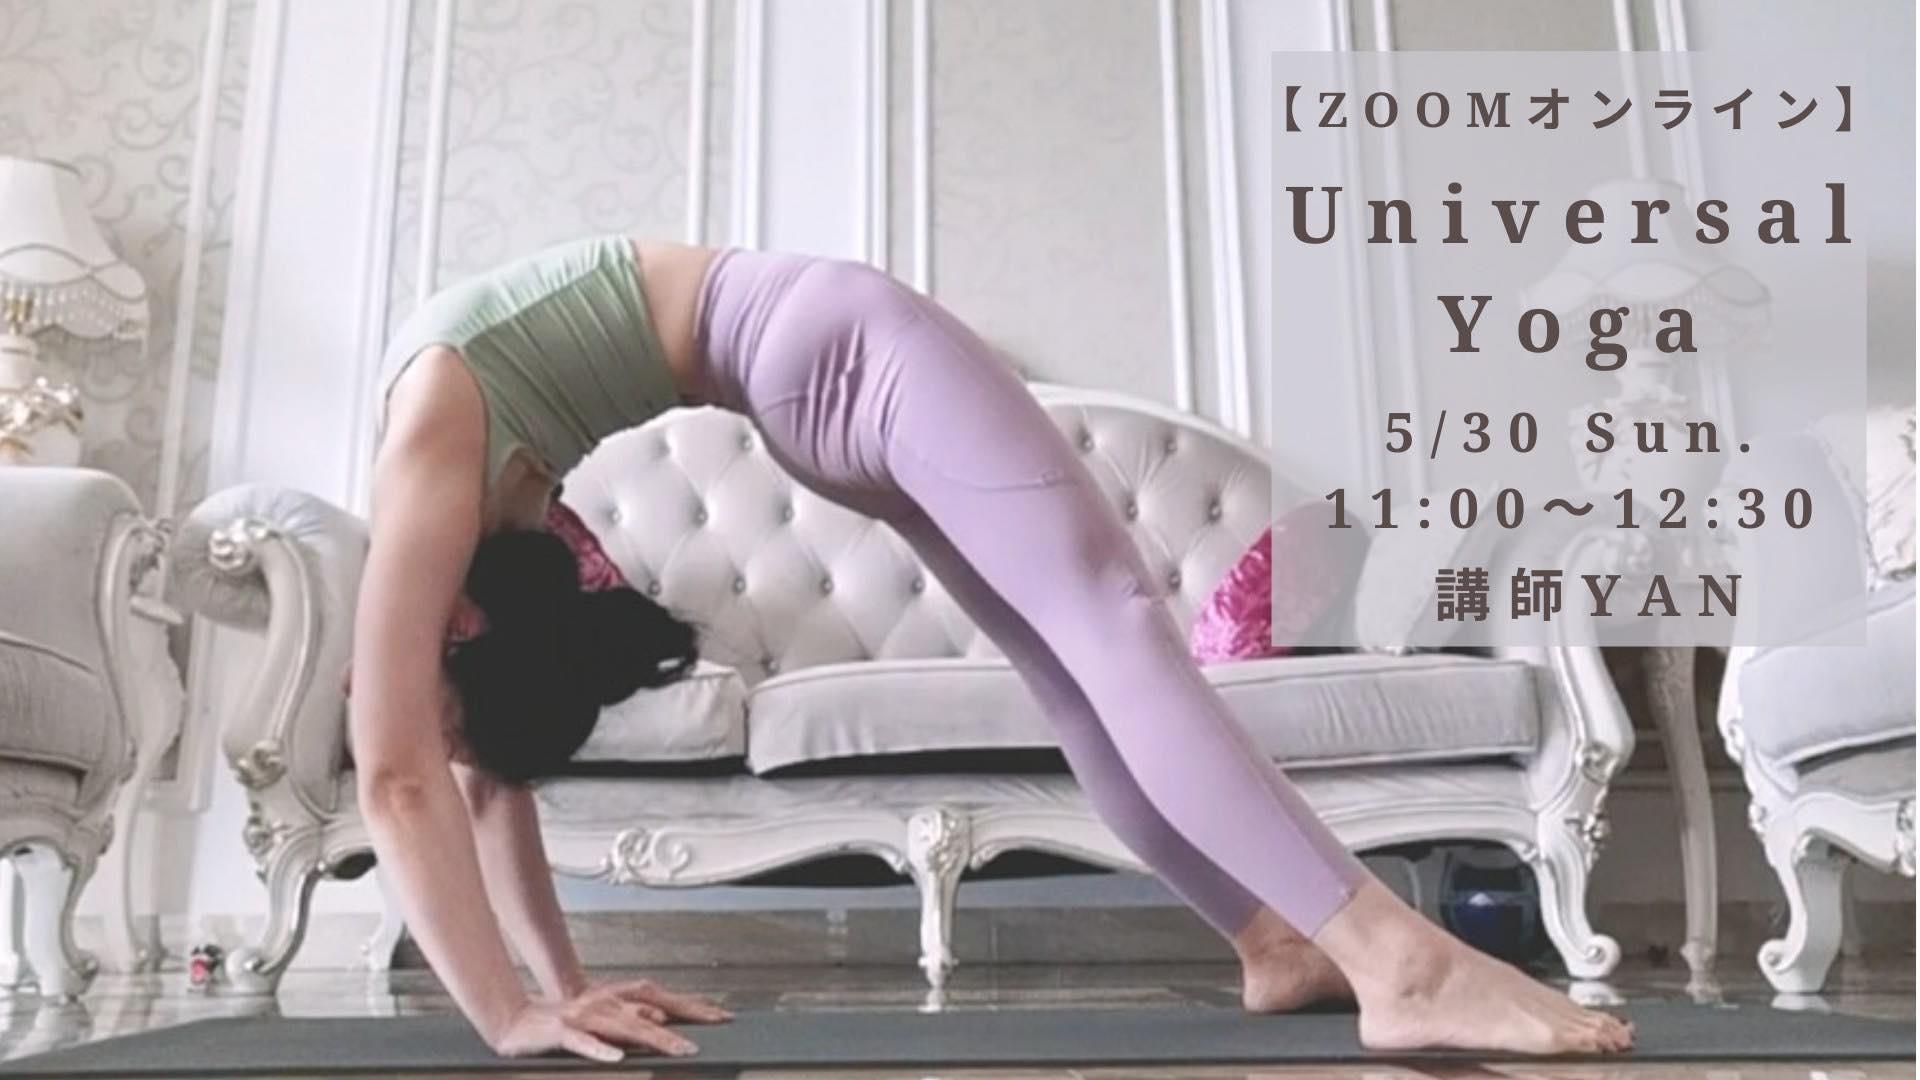 Universal Yoga ( ZOOM オンラインレッスン開催 )